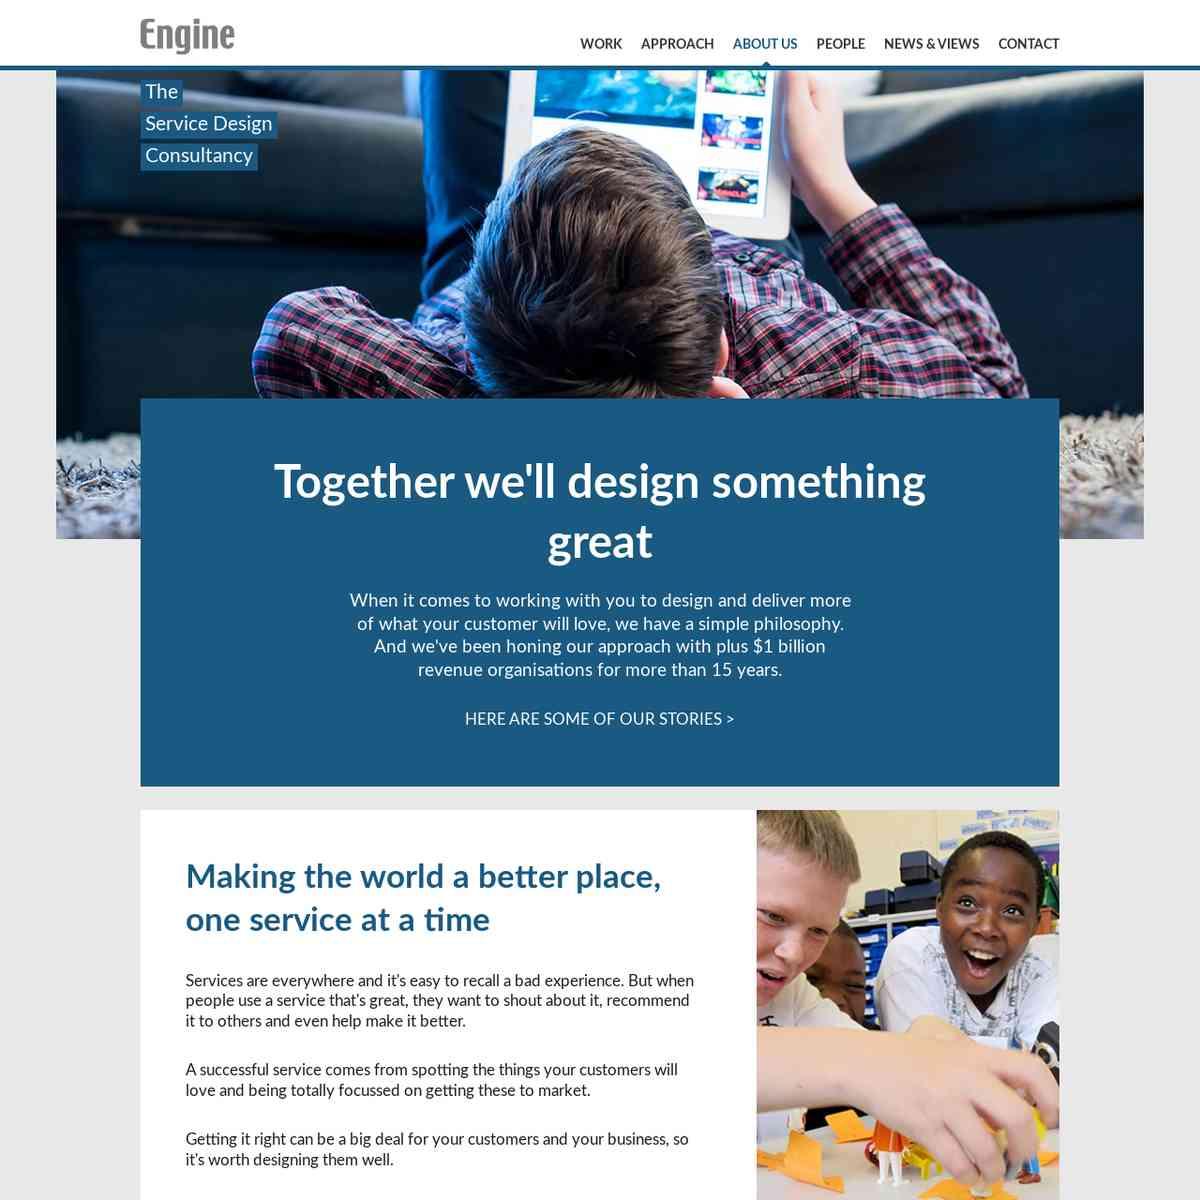 Engine Service Design | Service Design